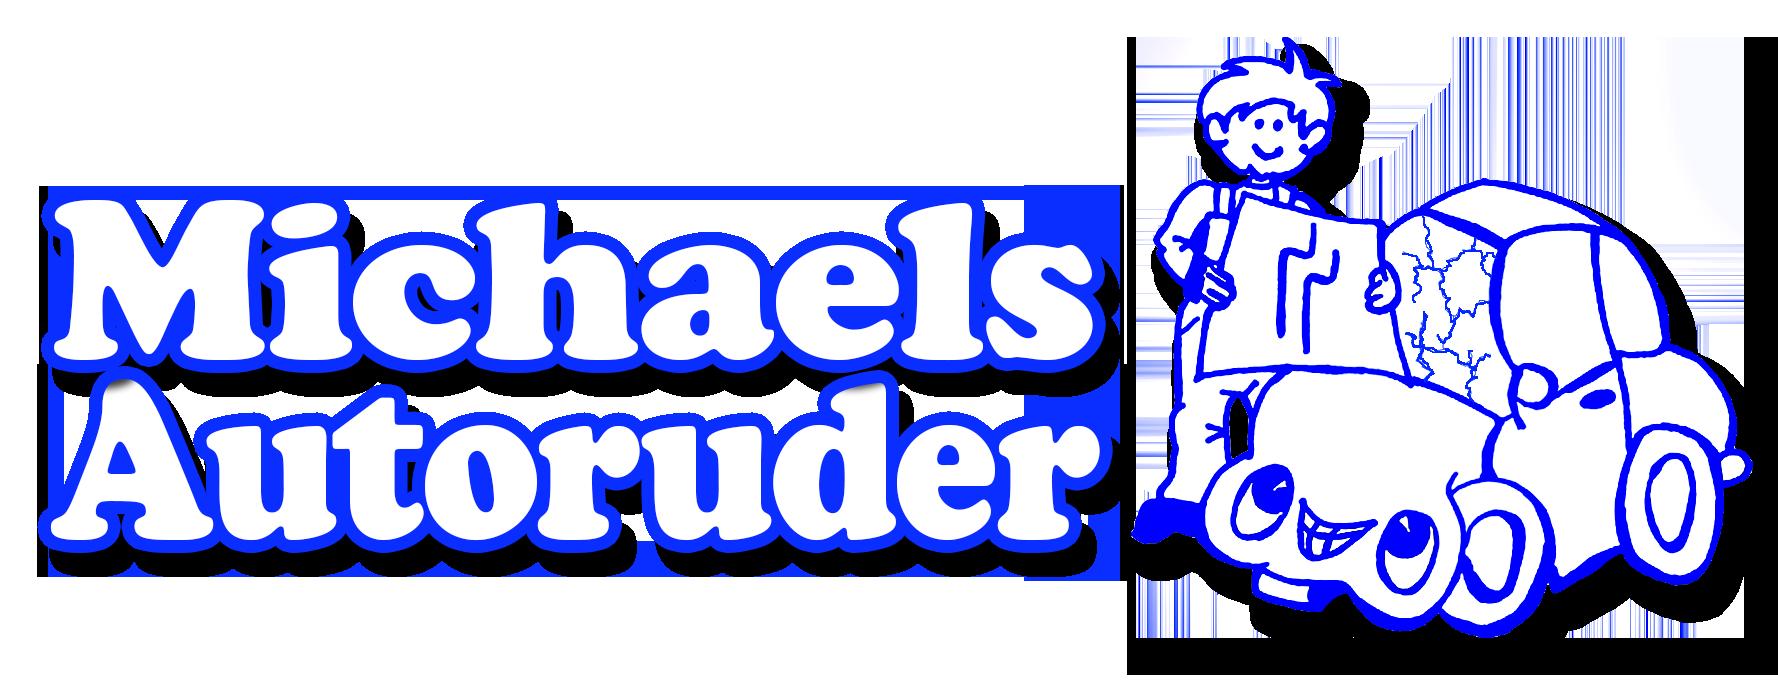 Michaels Autoruder